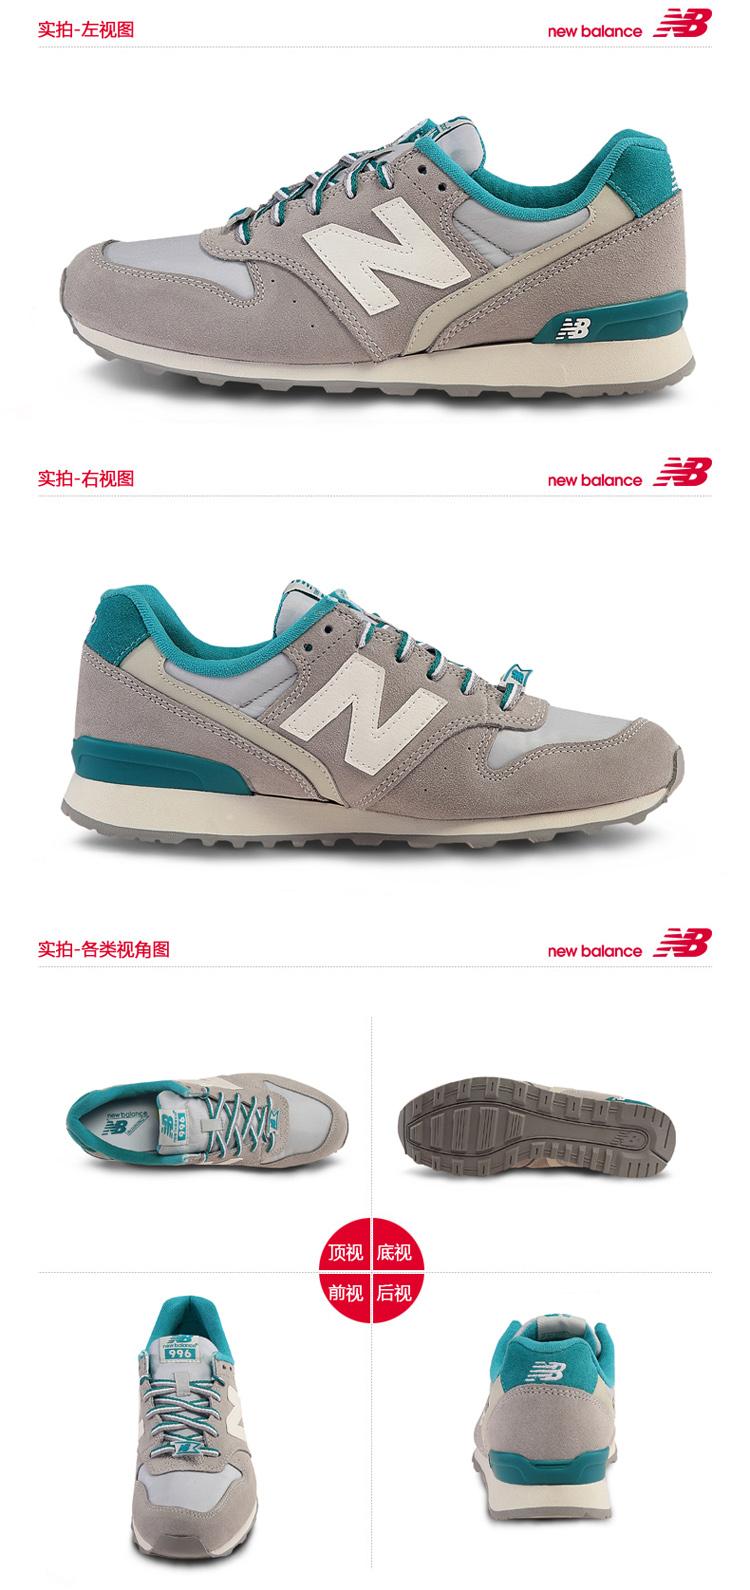 balance/nb女鞋 复古鞋